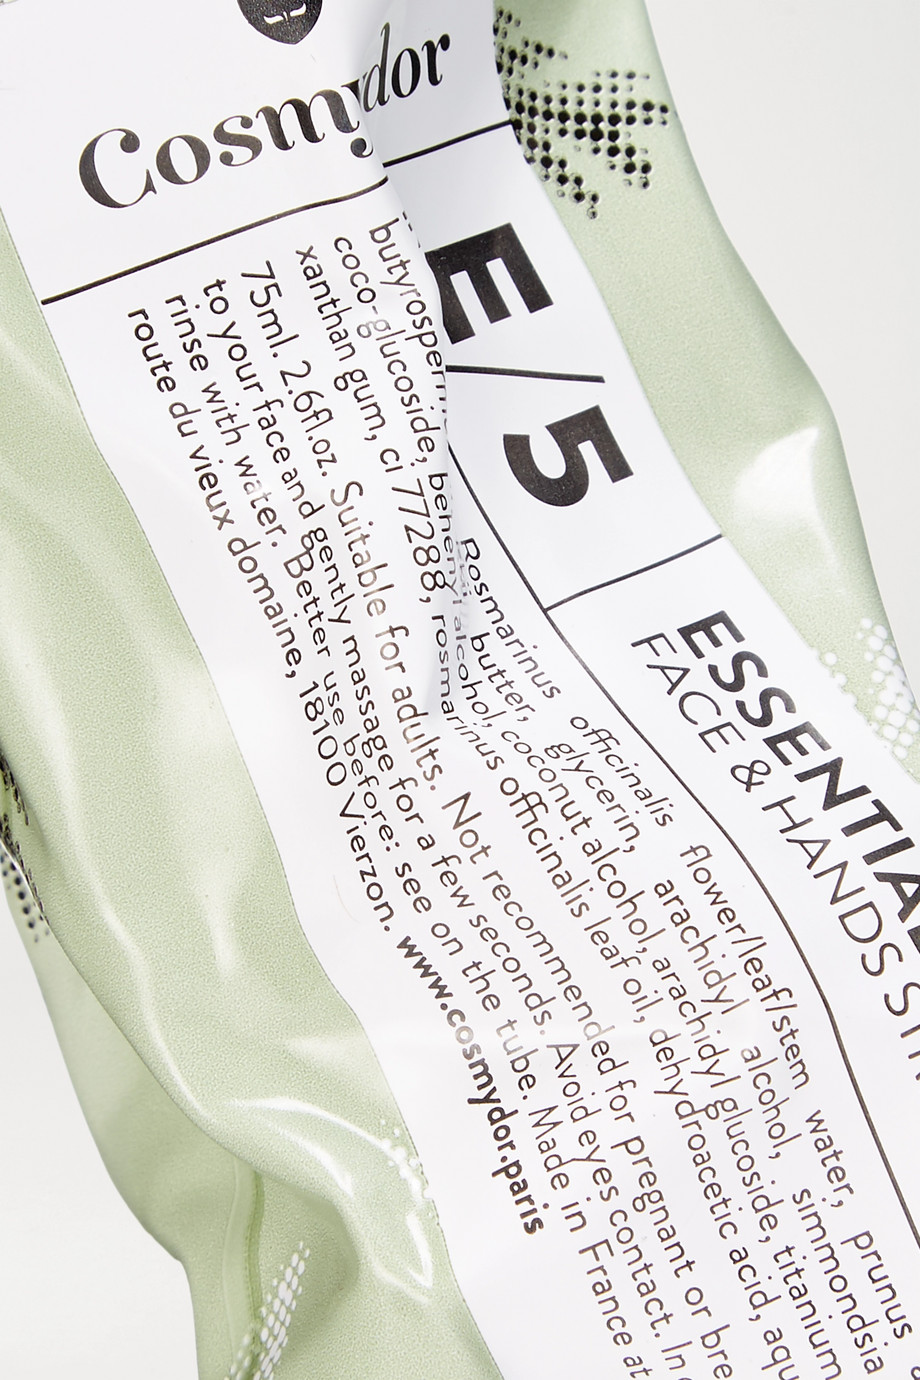 Cosmydor 【NET SUSTAIN】E/5 迷迭香基础护肤霜,75ml